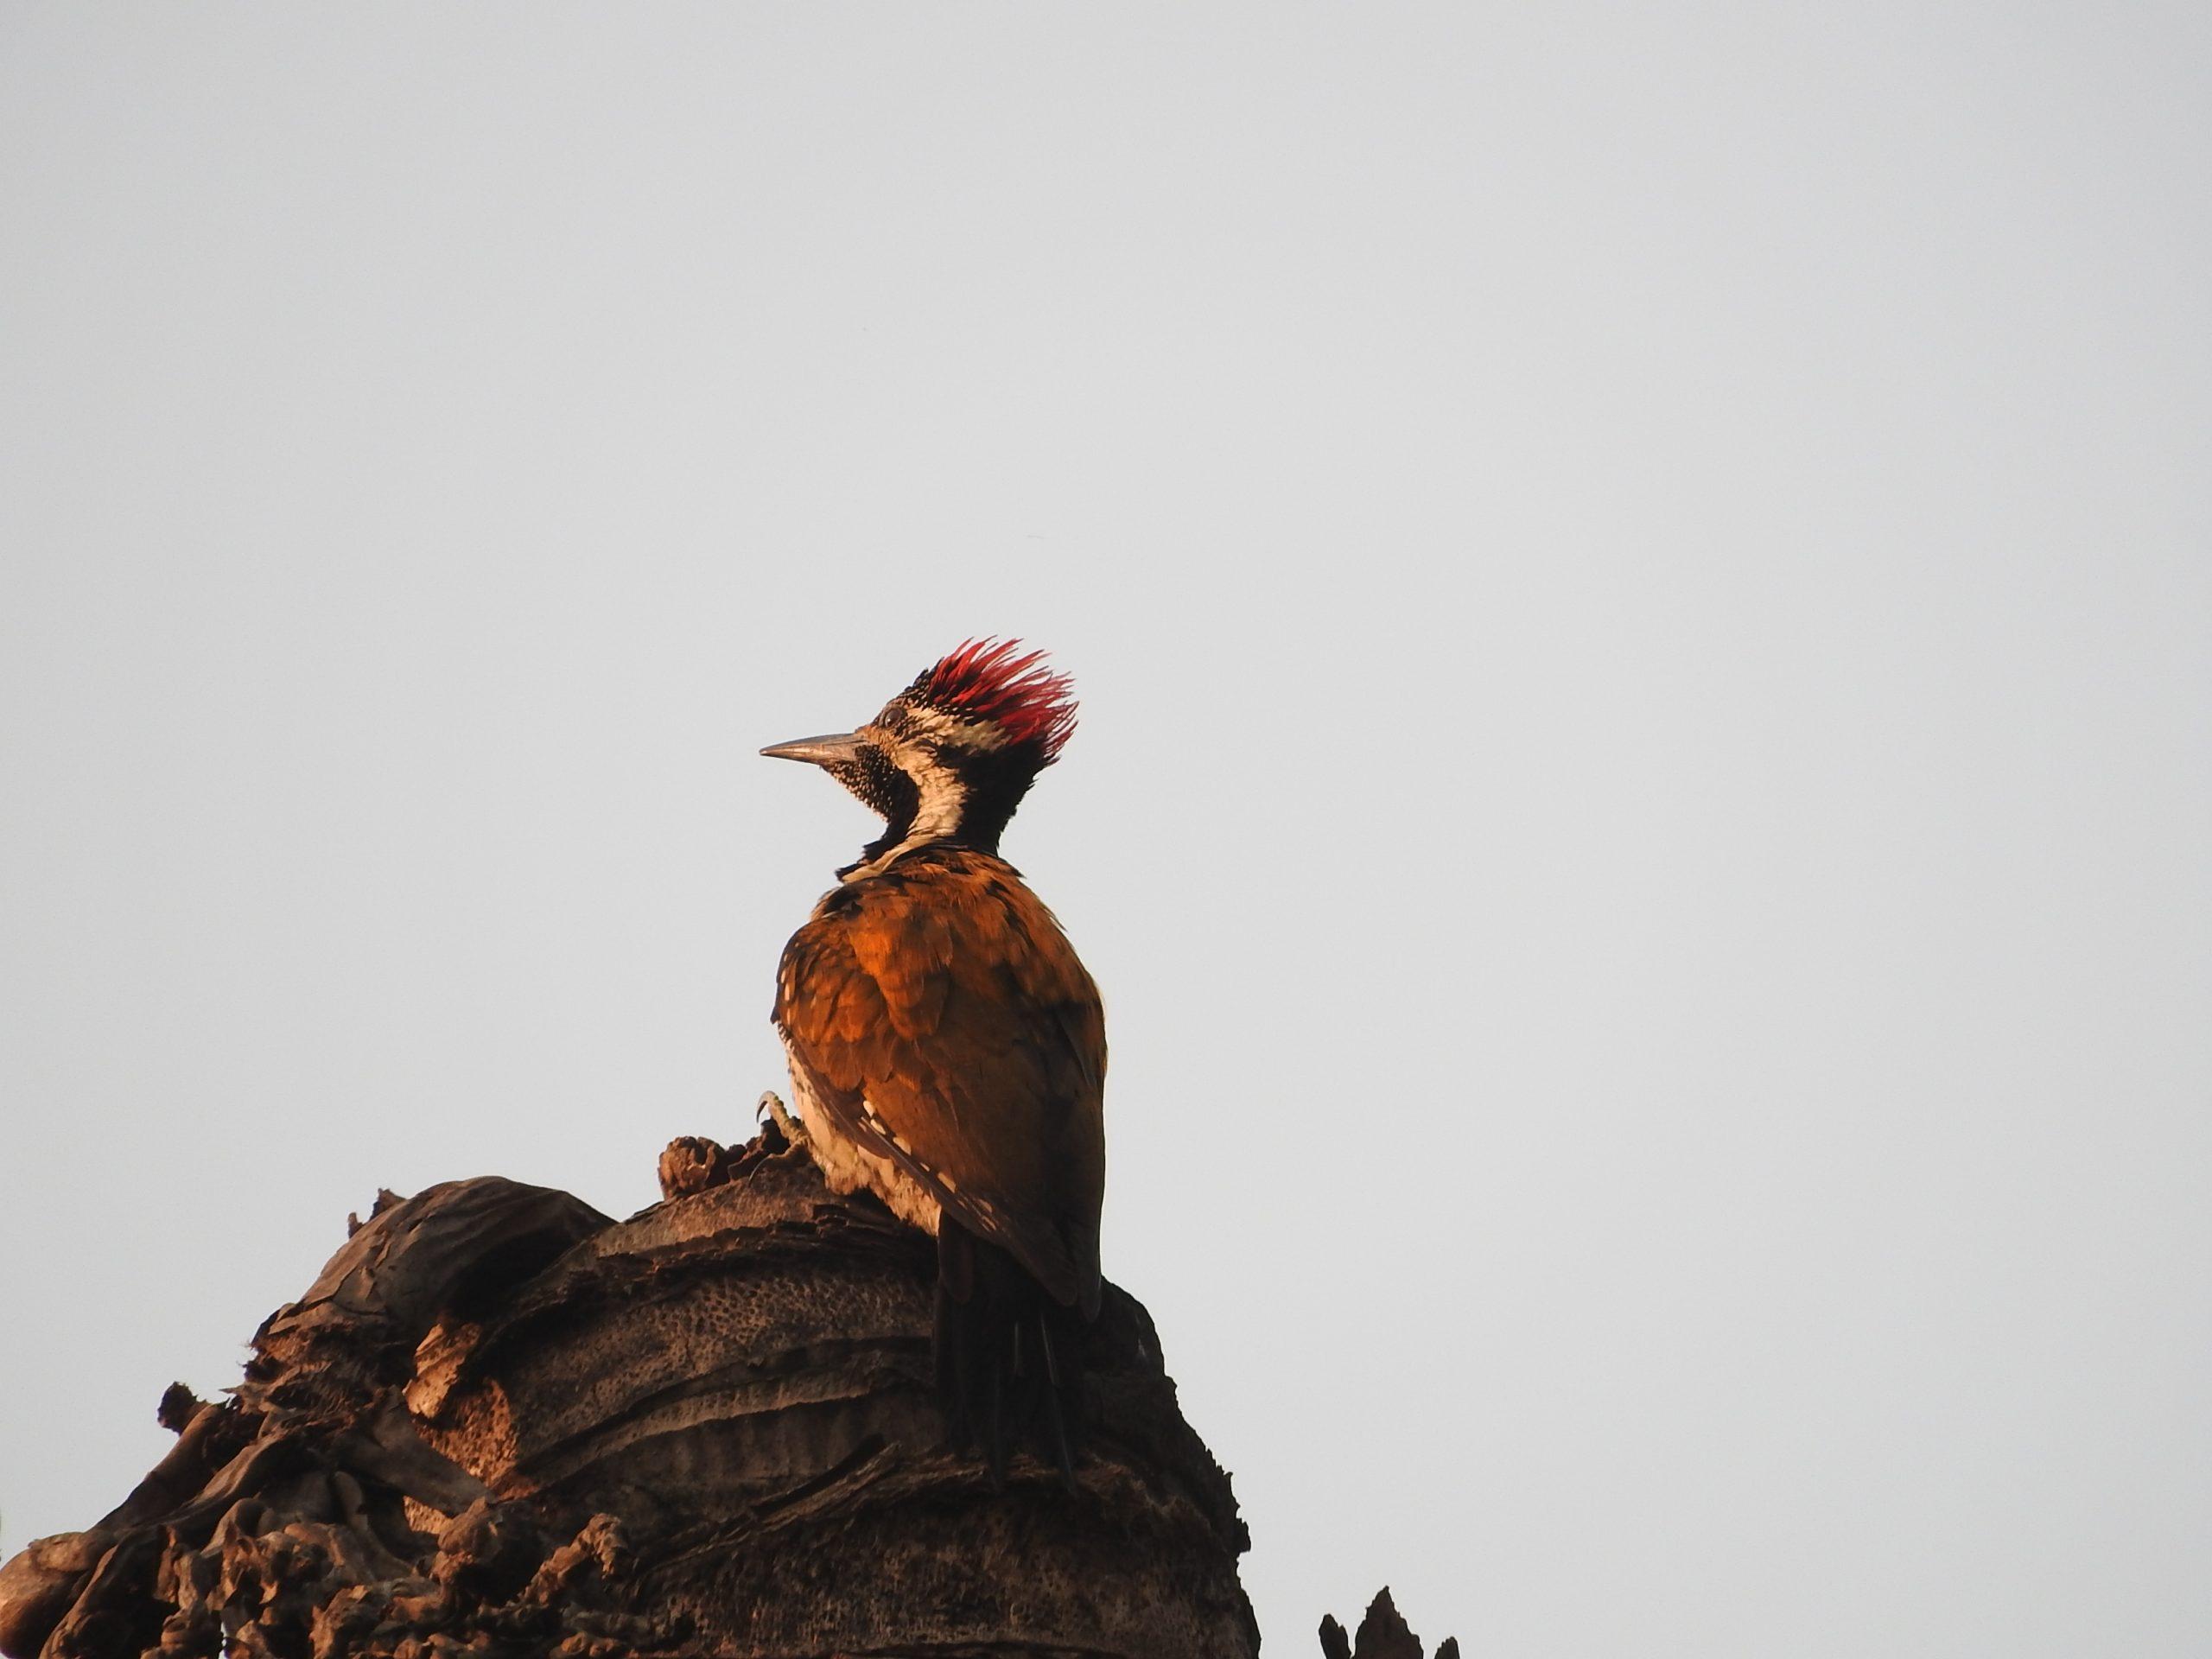 Woodpecker sitting on a coconut tree